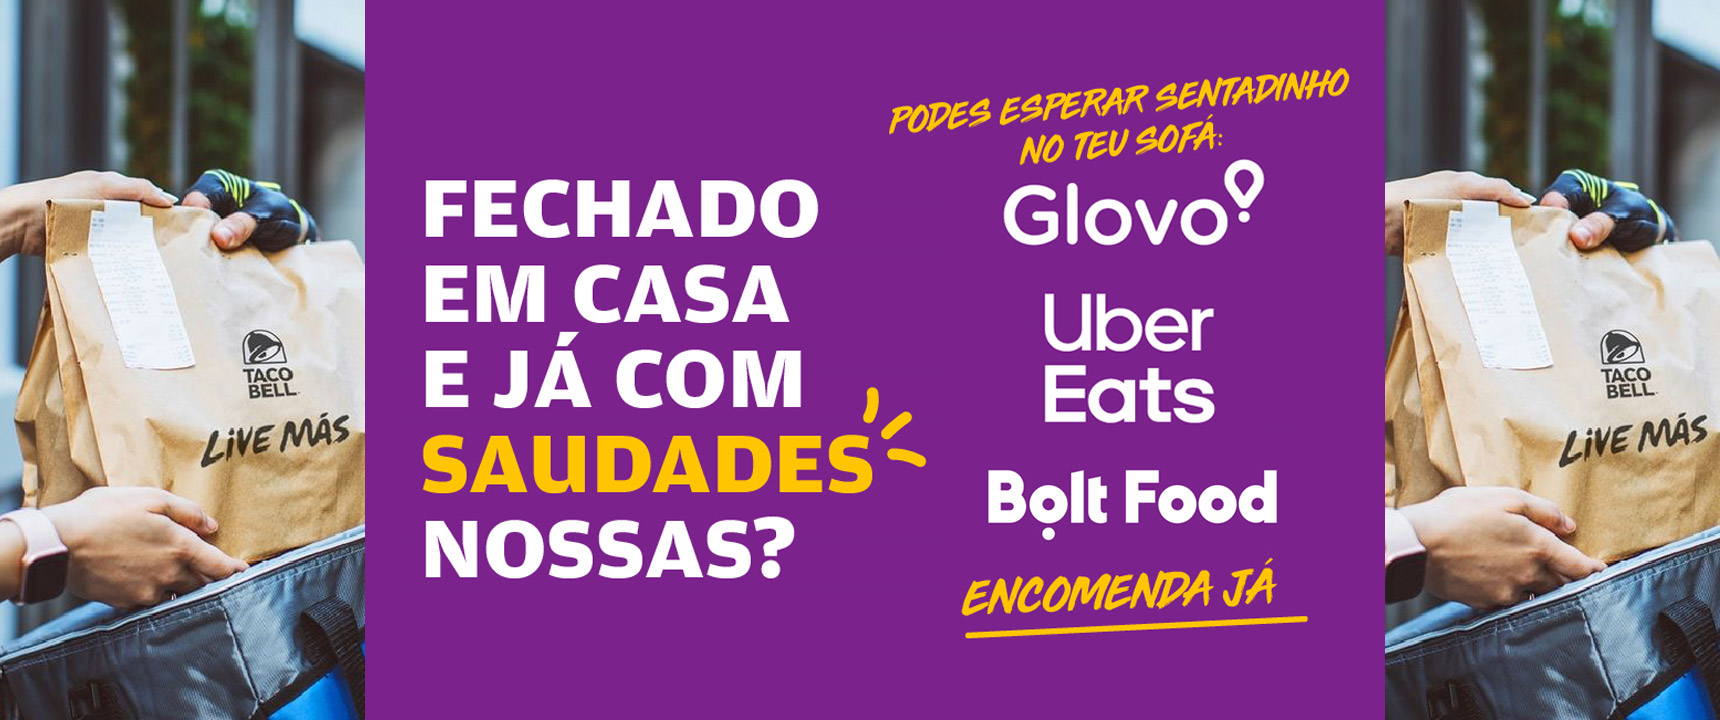 ENCOMENDA JÁ| Taco Bell Portugal